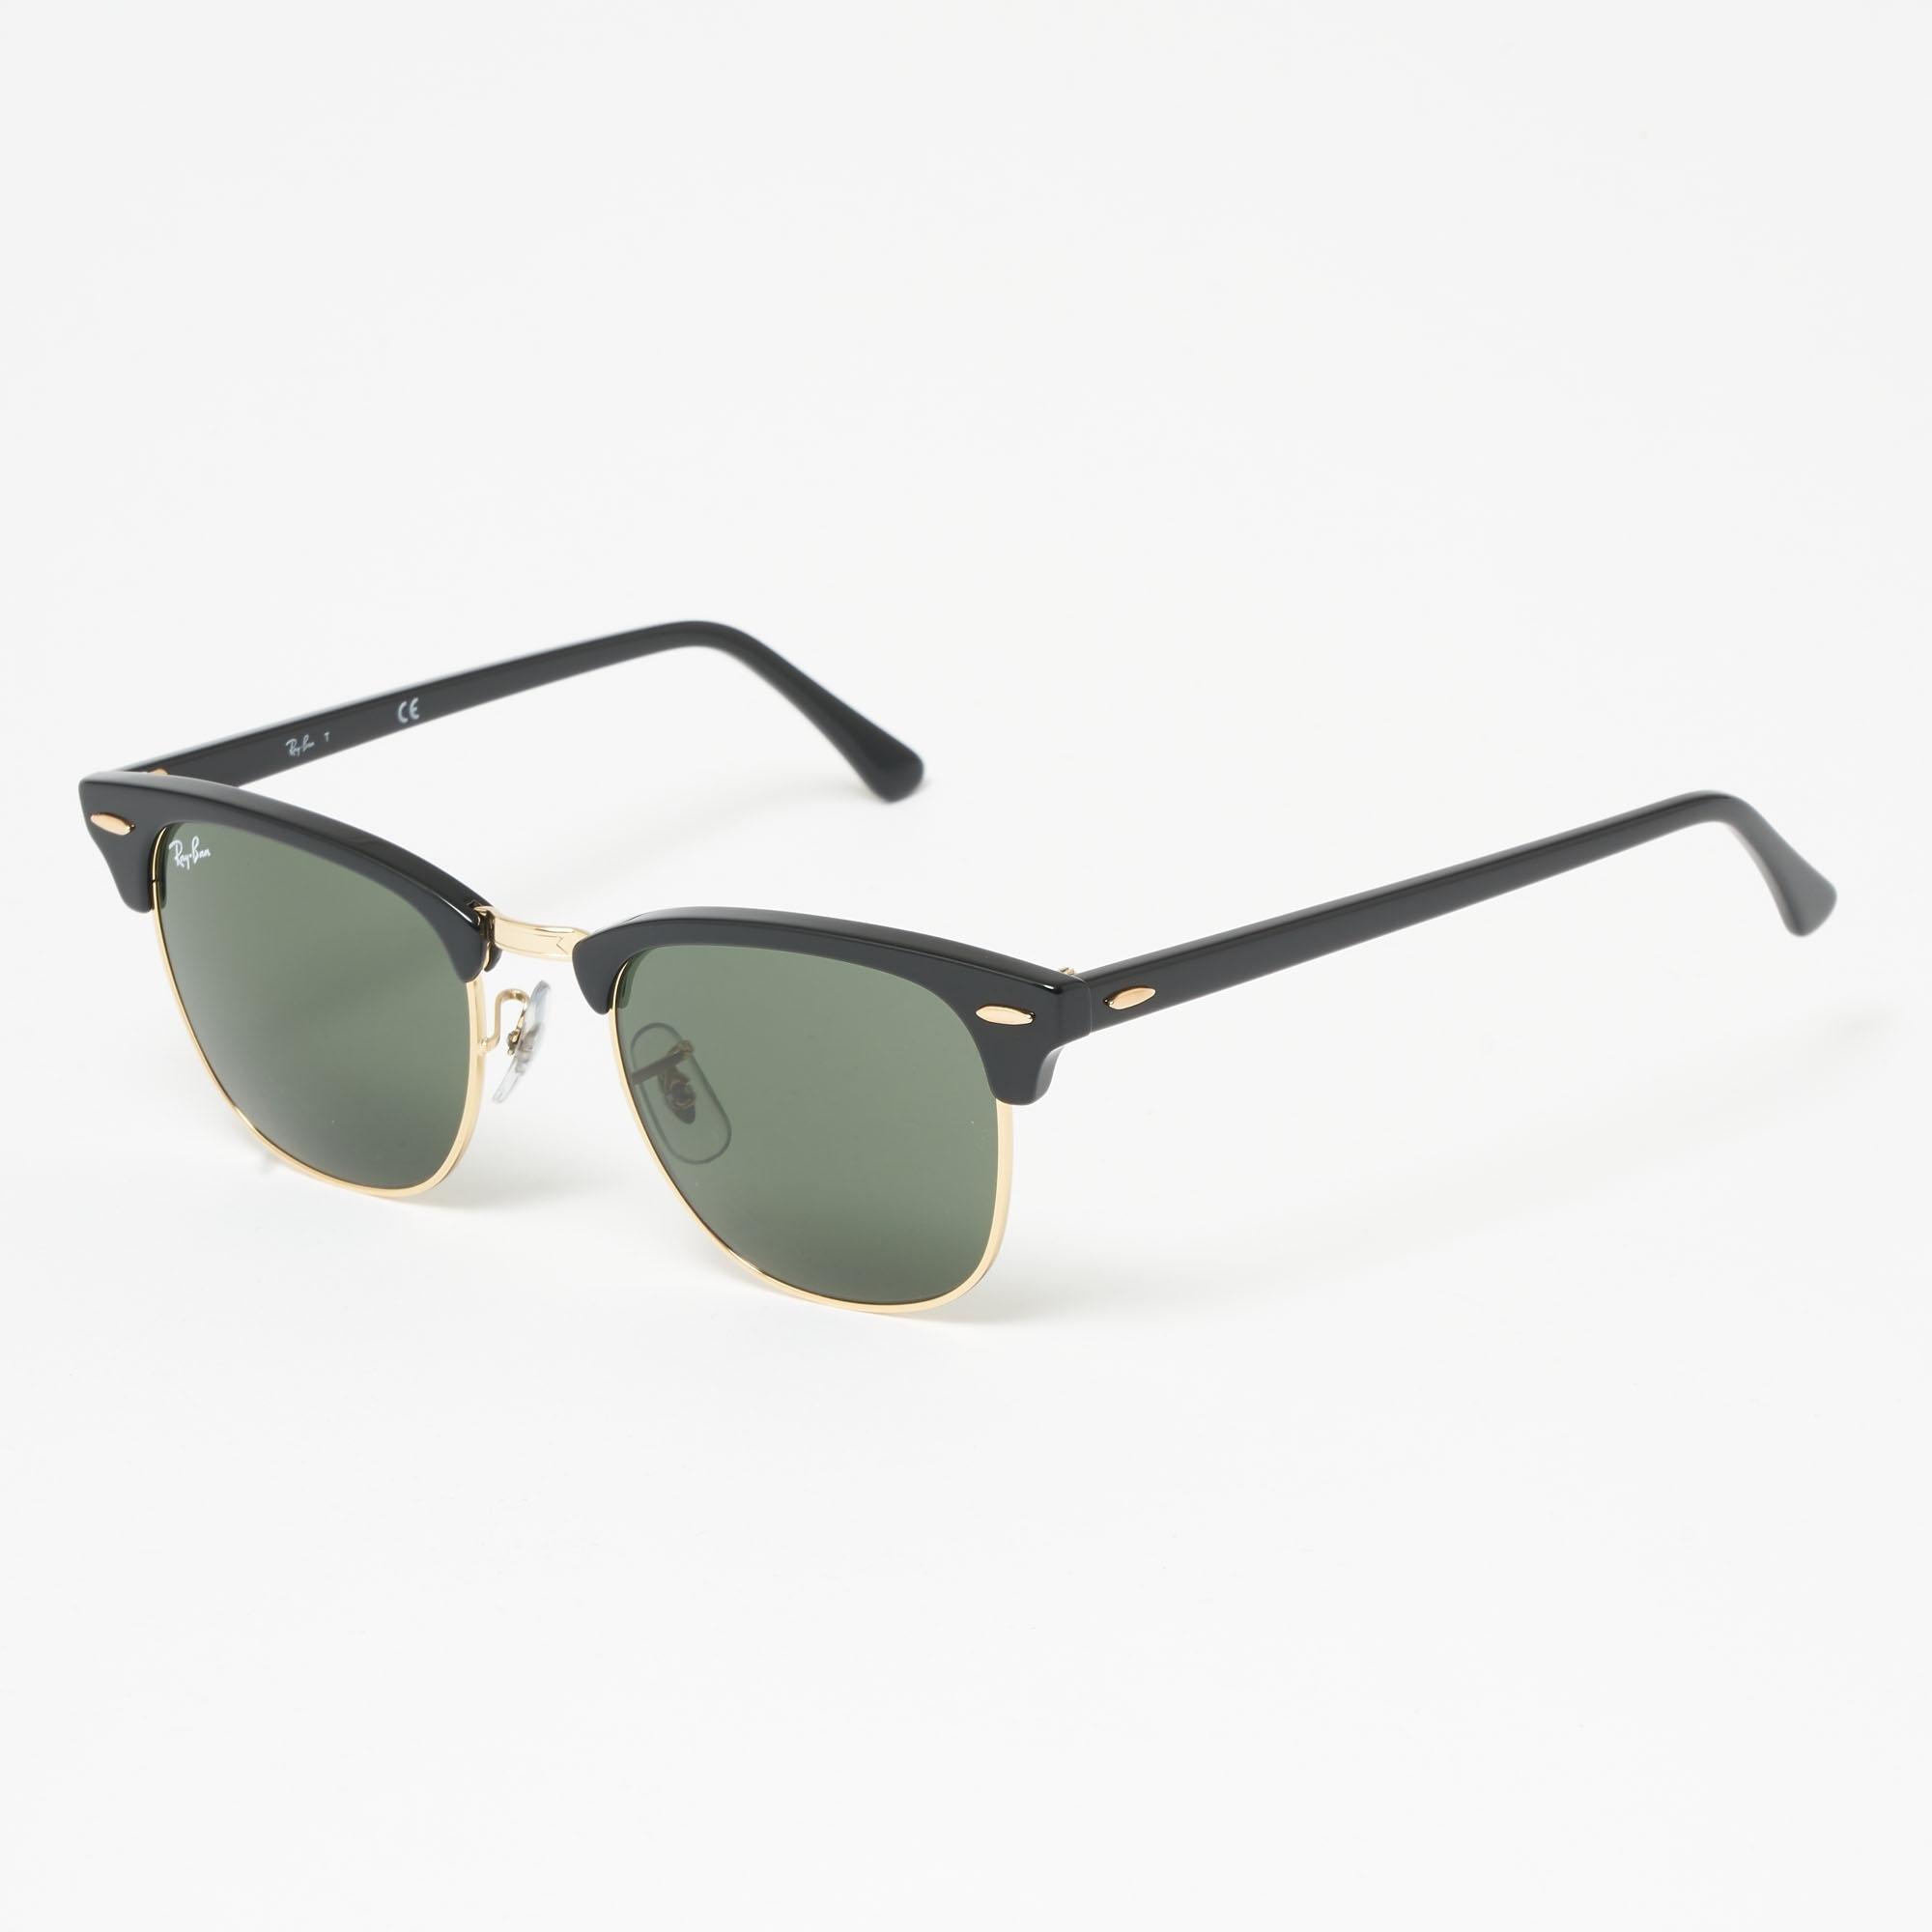 77fa1ff751f Black Clubround Classic Sunglasses - Green Classic G-15 Lenses